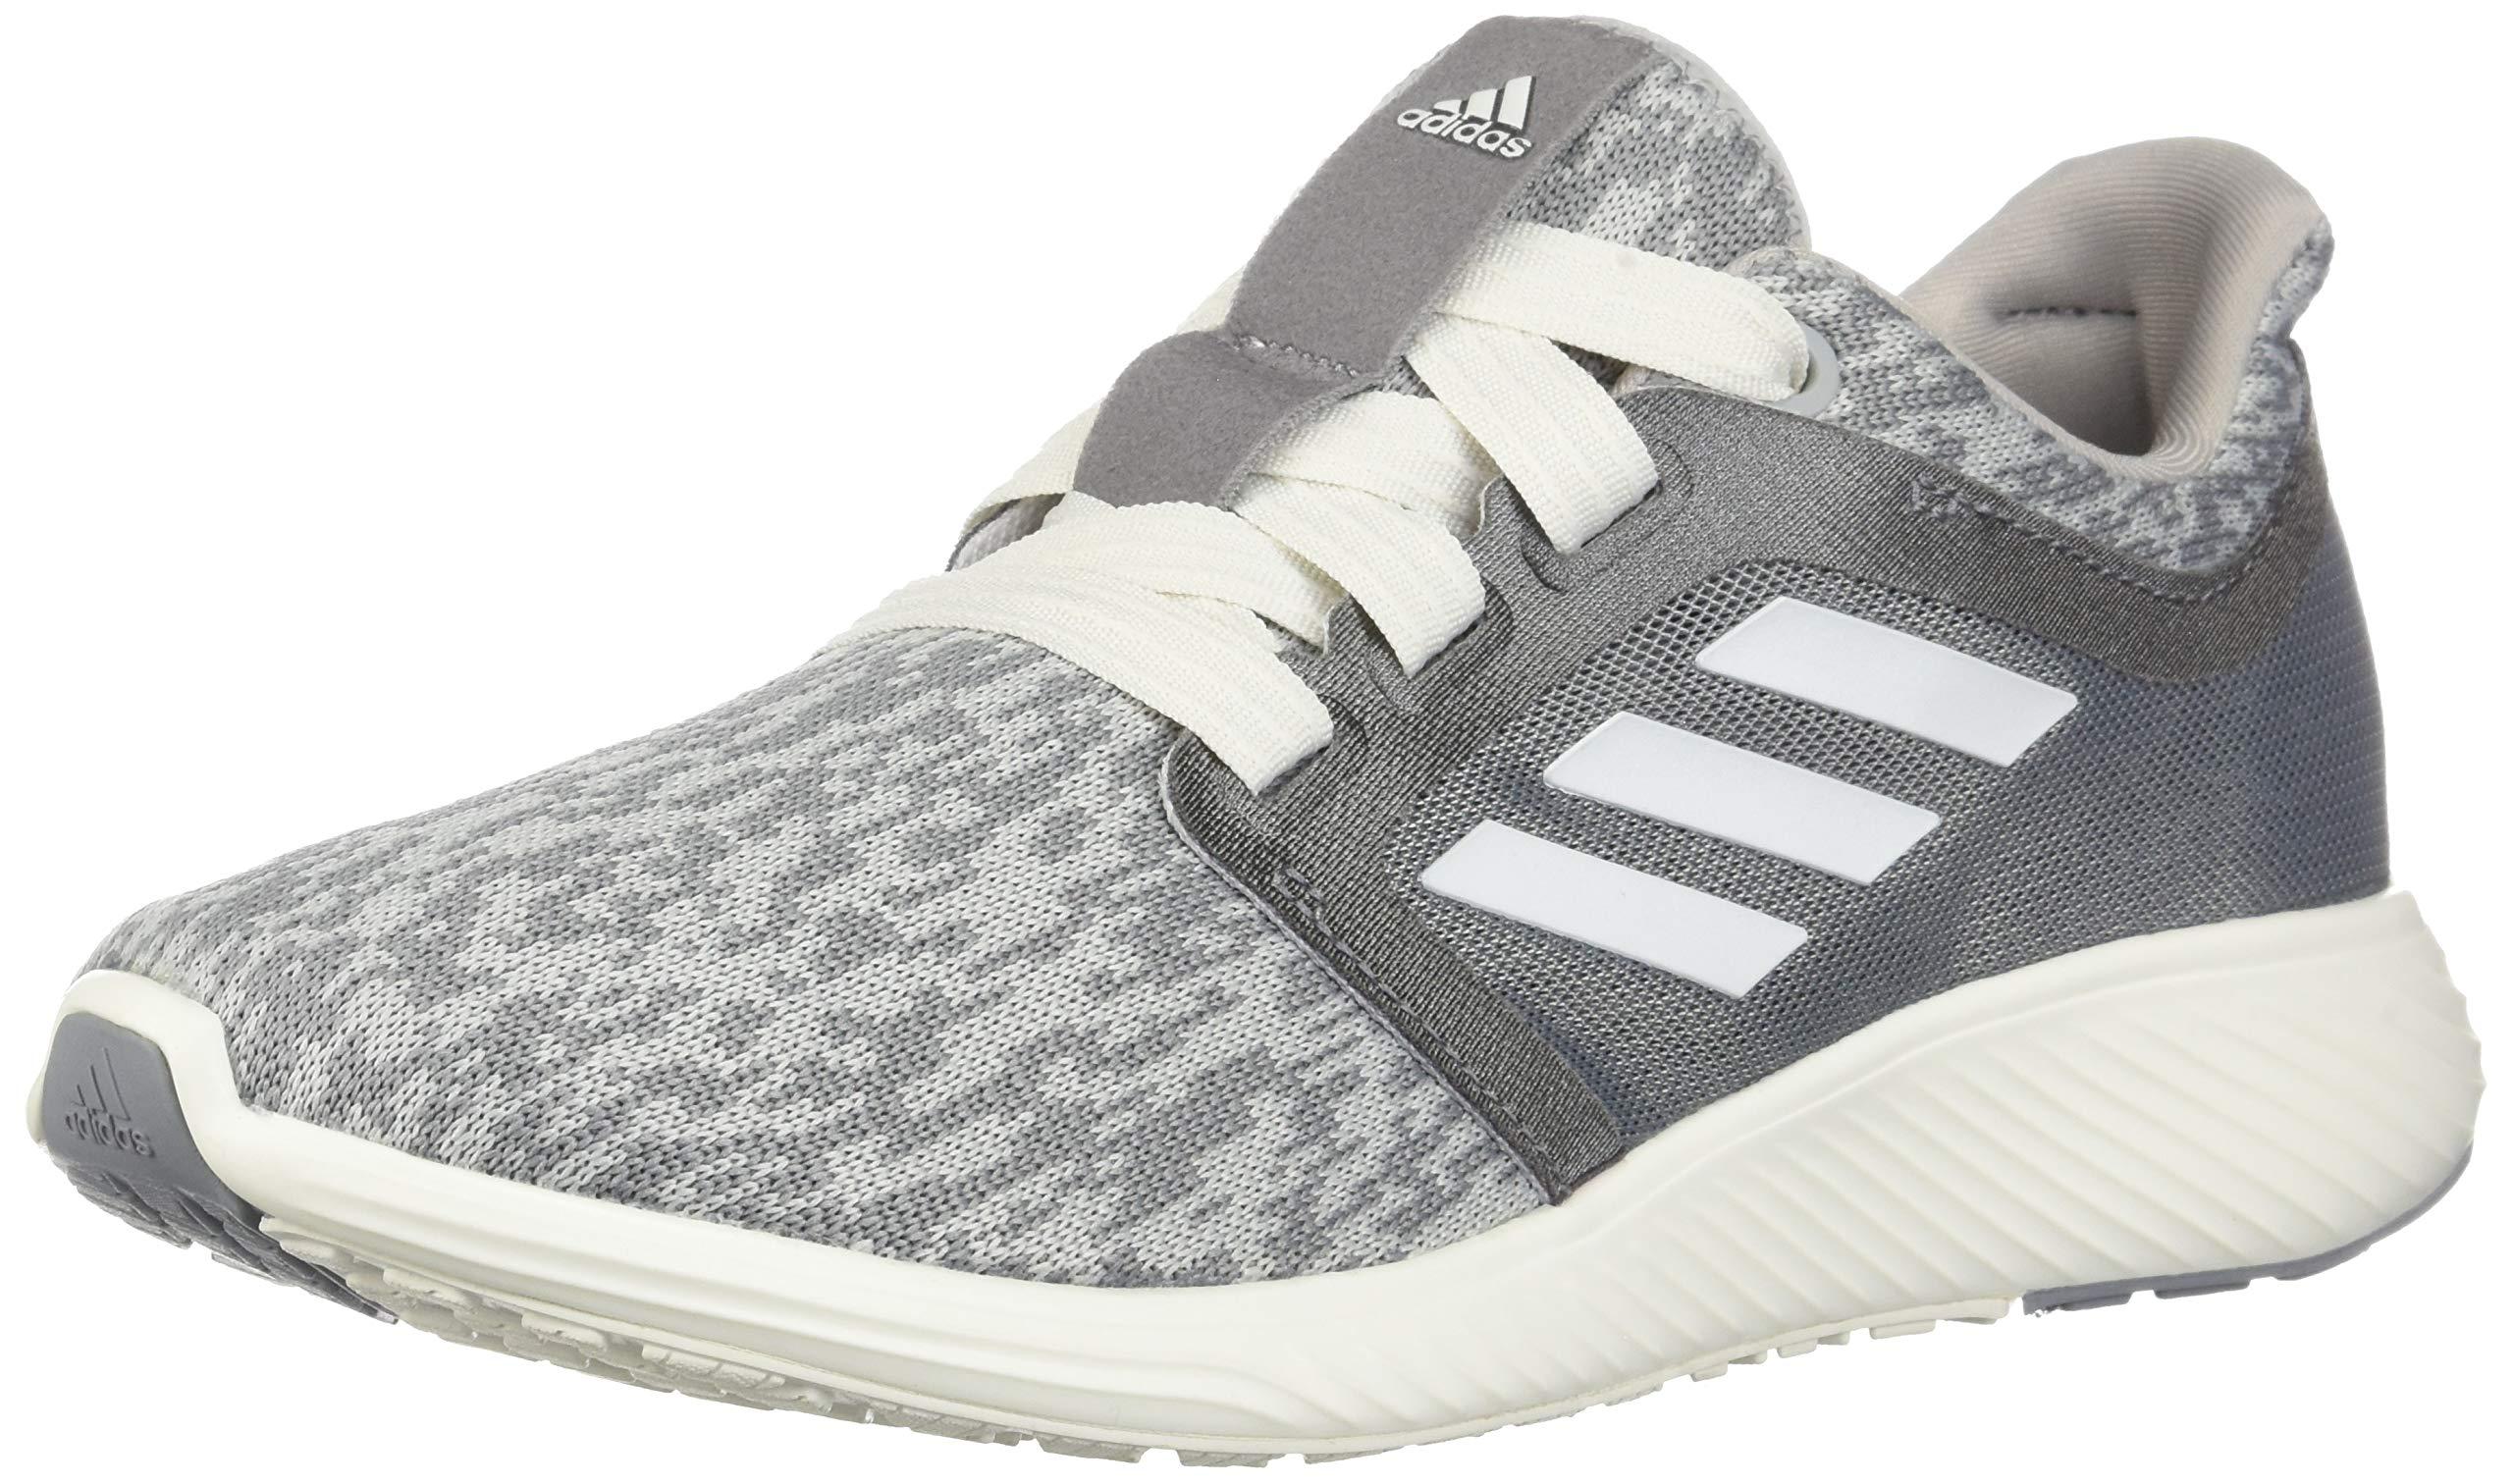 adidas Women's Edge Lux 3, Grey/Cloud White/Silver Metallic 5 M US